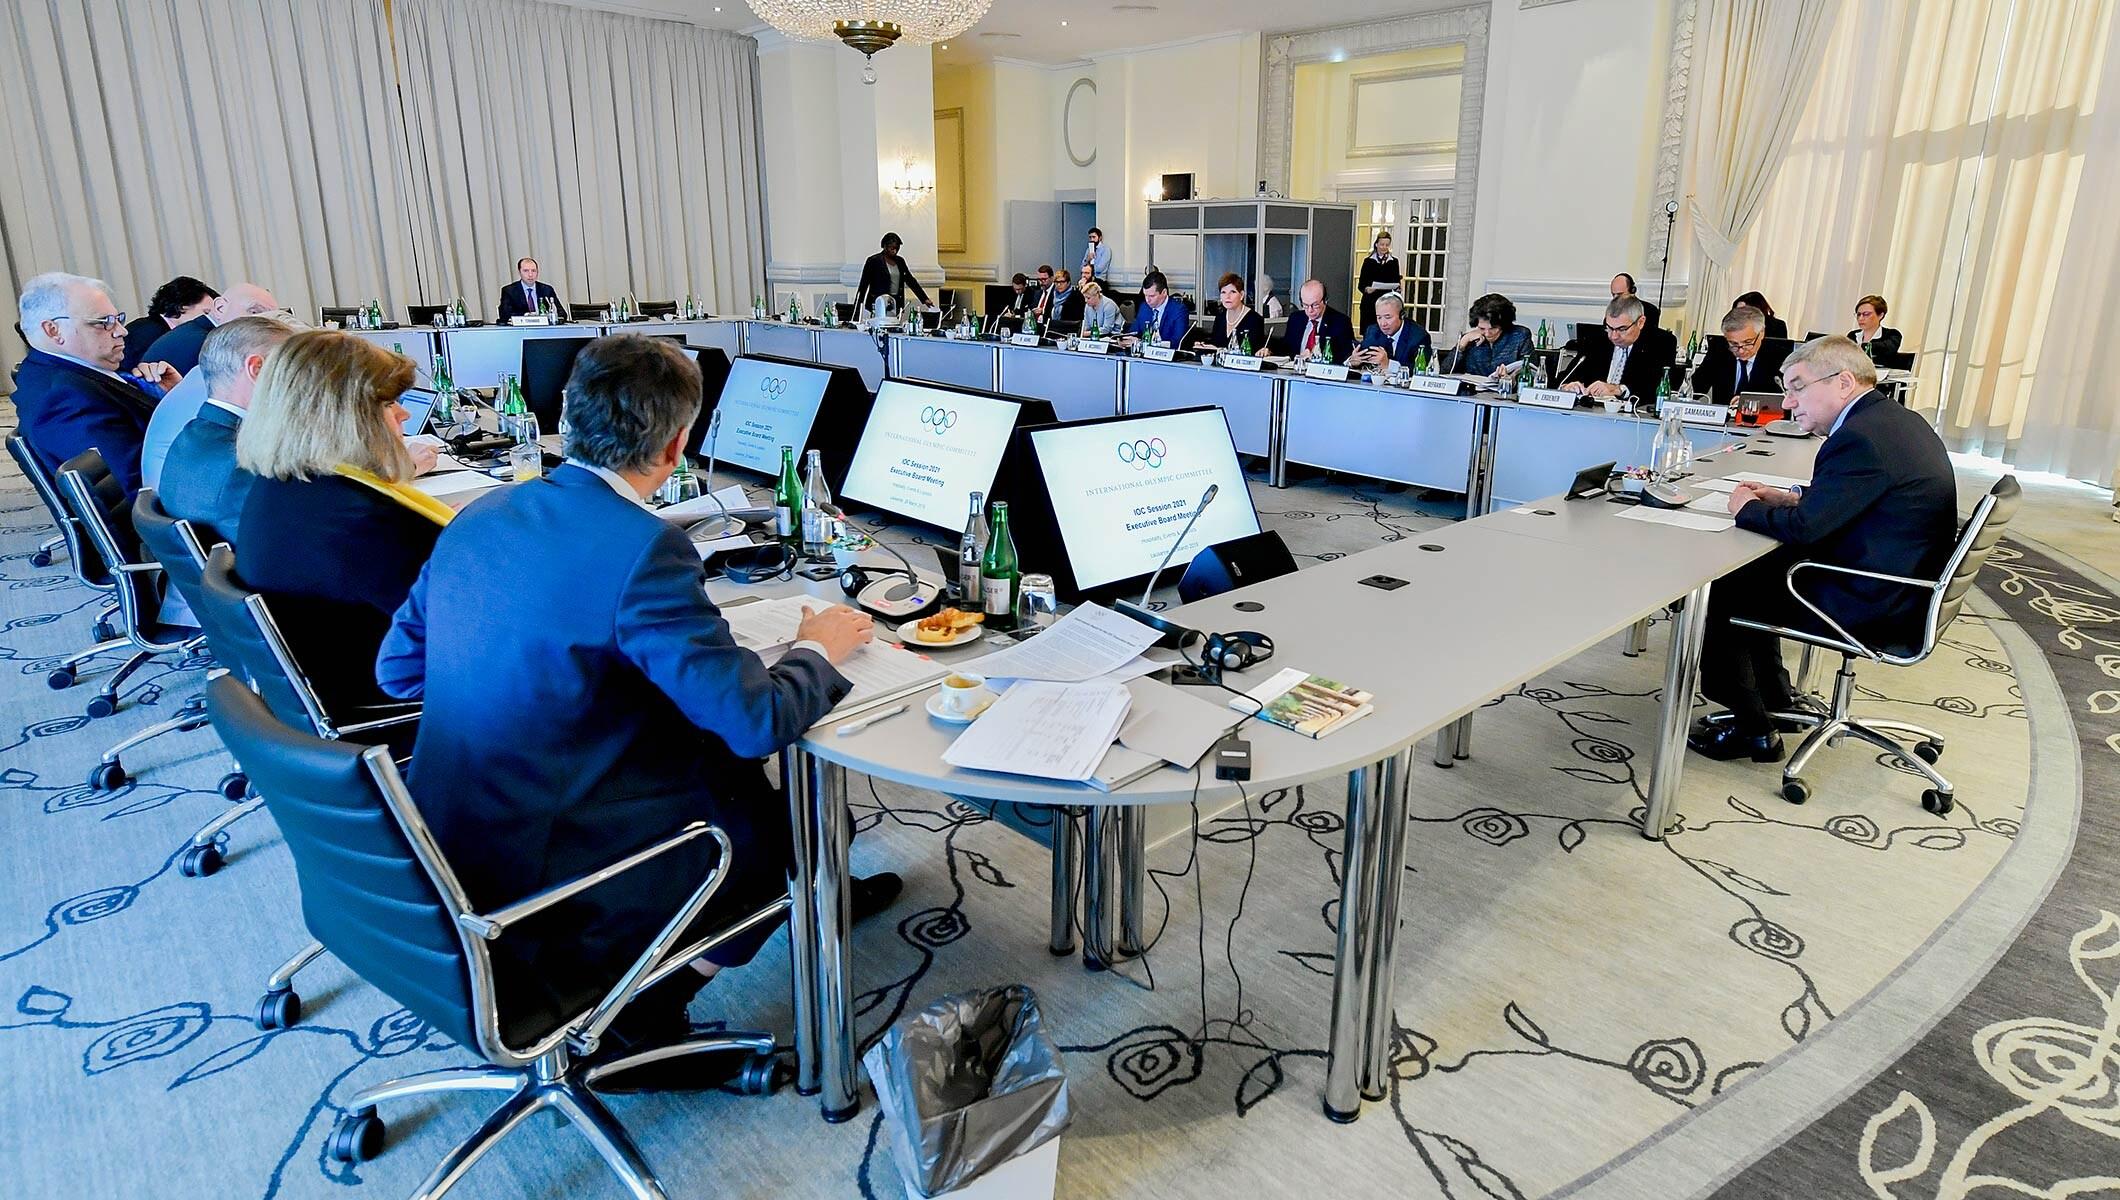 IOC Executive Board meeting Lausanne